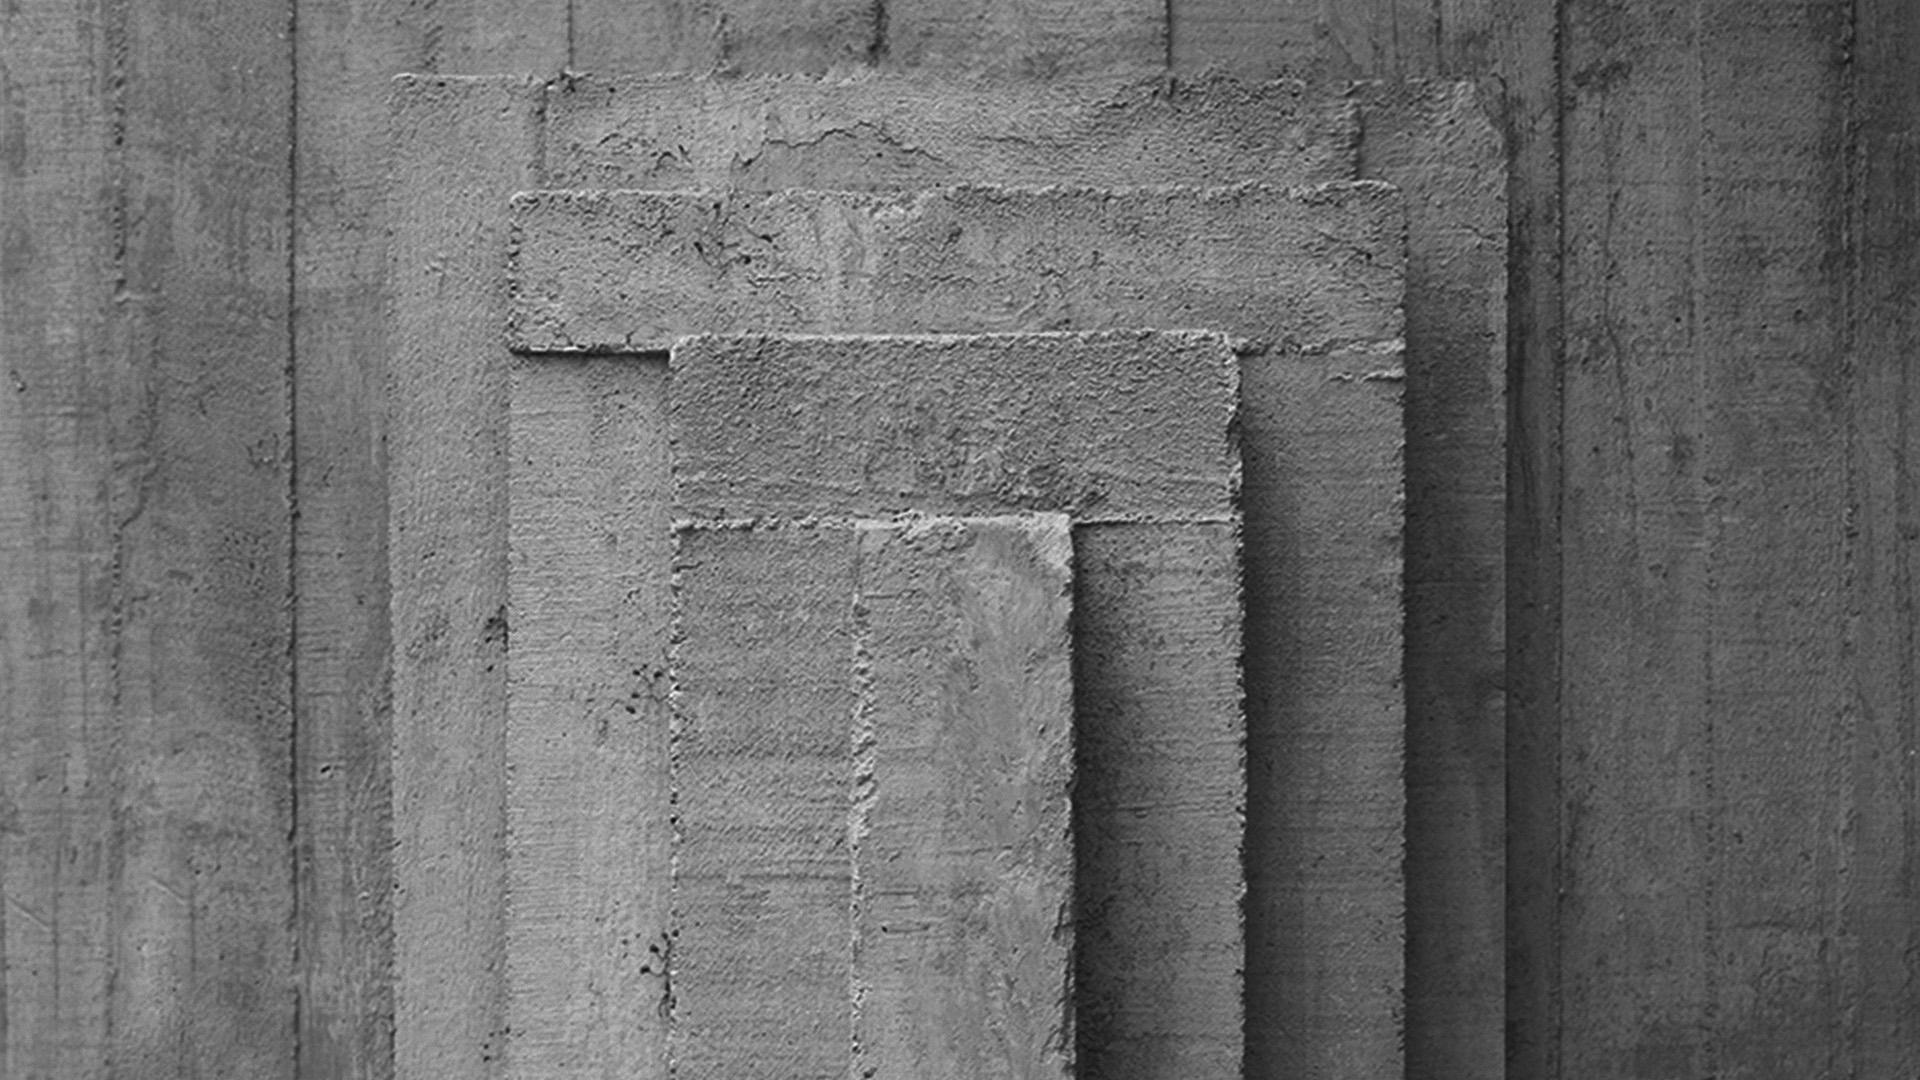 vx19-texture-wallpapers-pattern-background-bw-dark-wallpaper